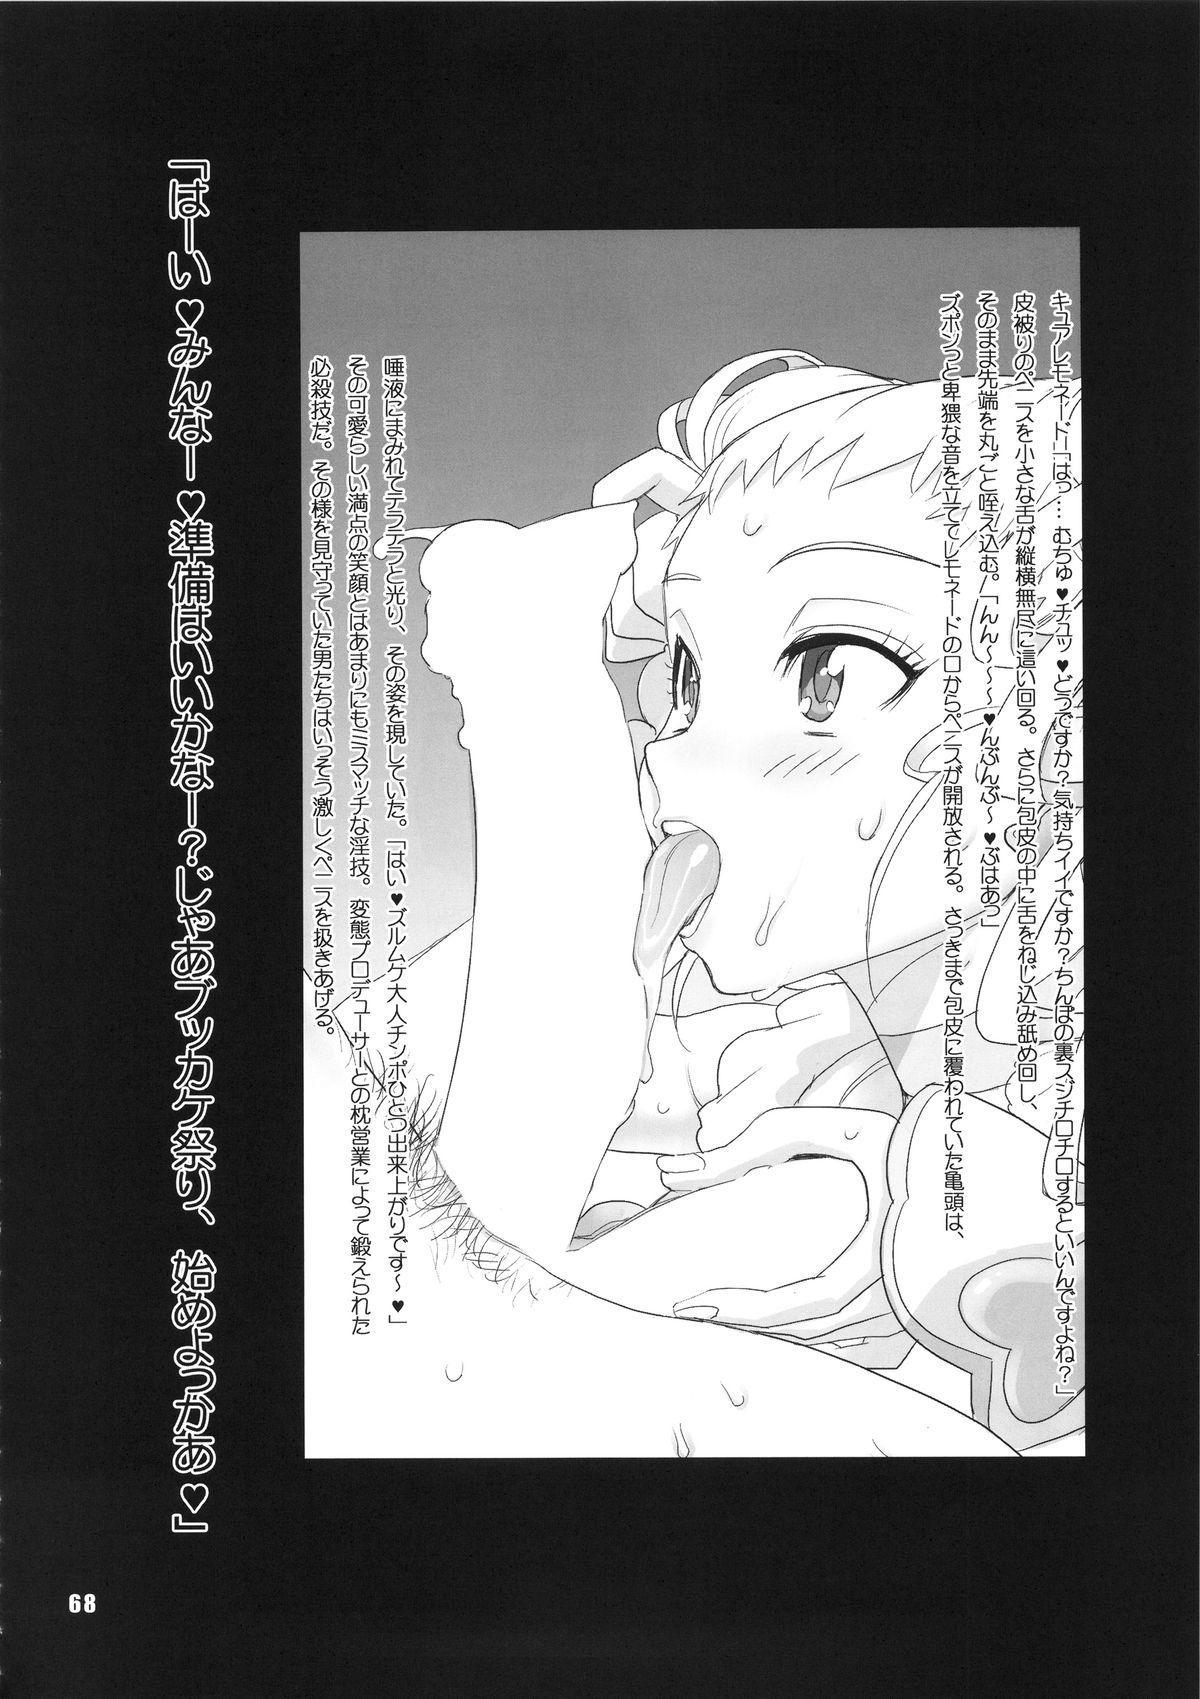 Inazuma Pretty Warrior 66